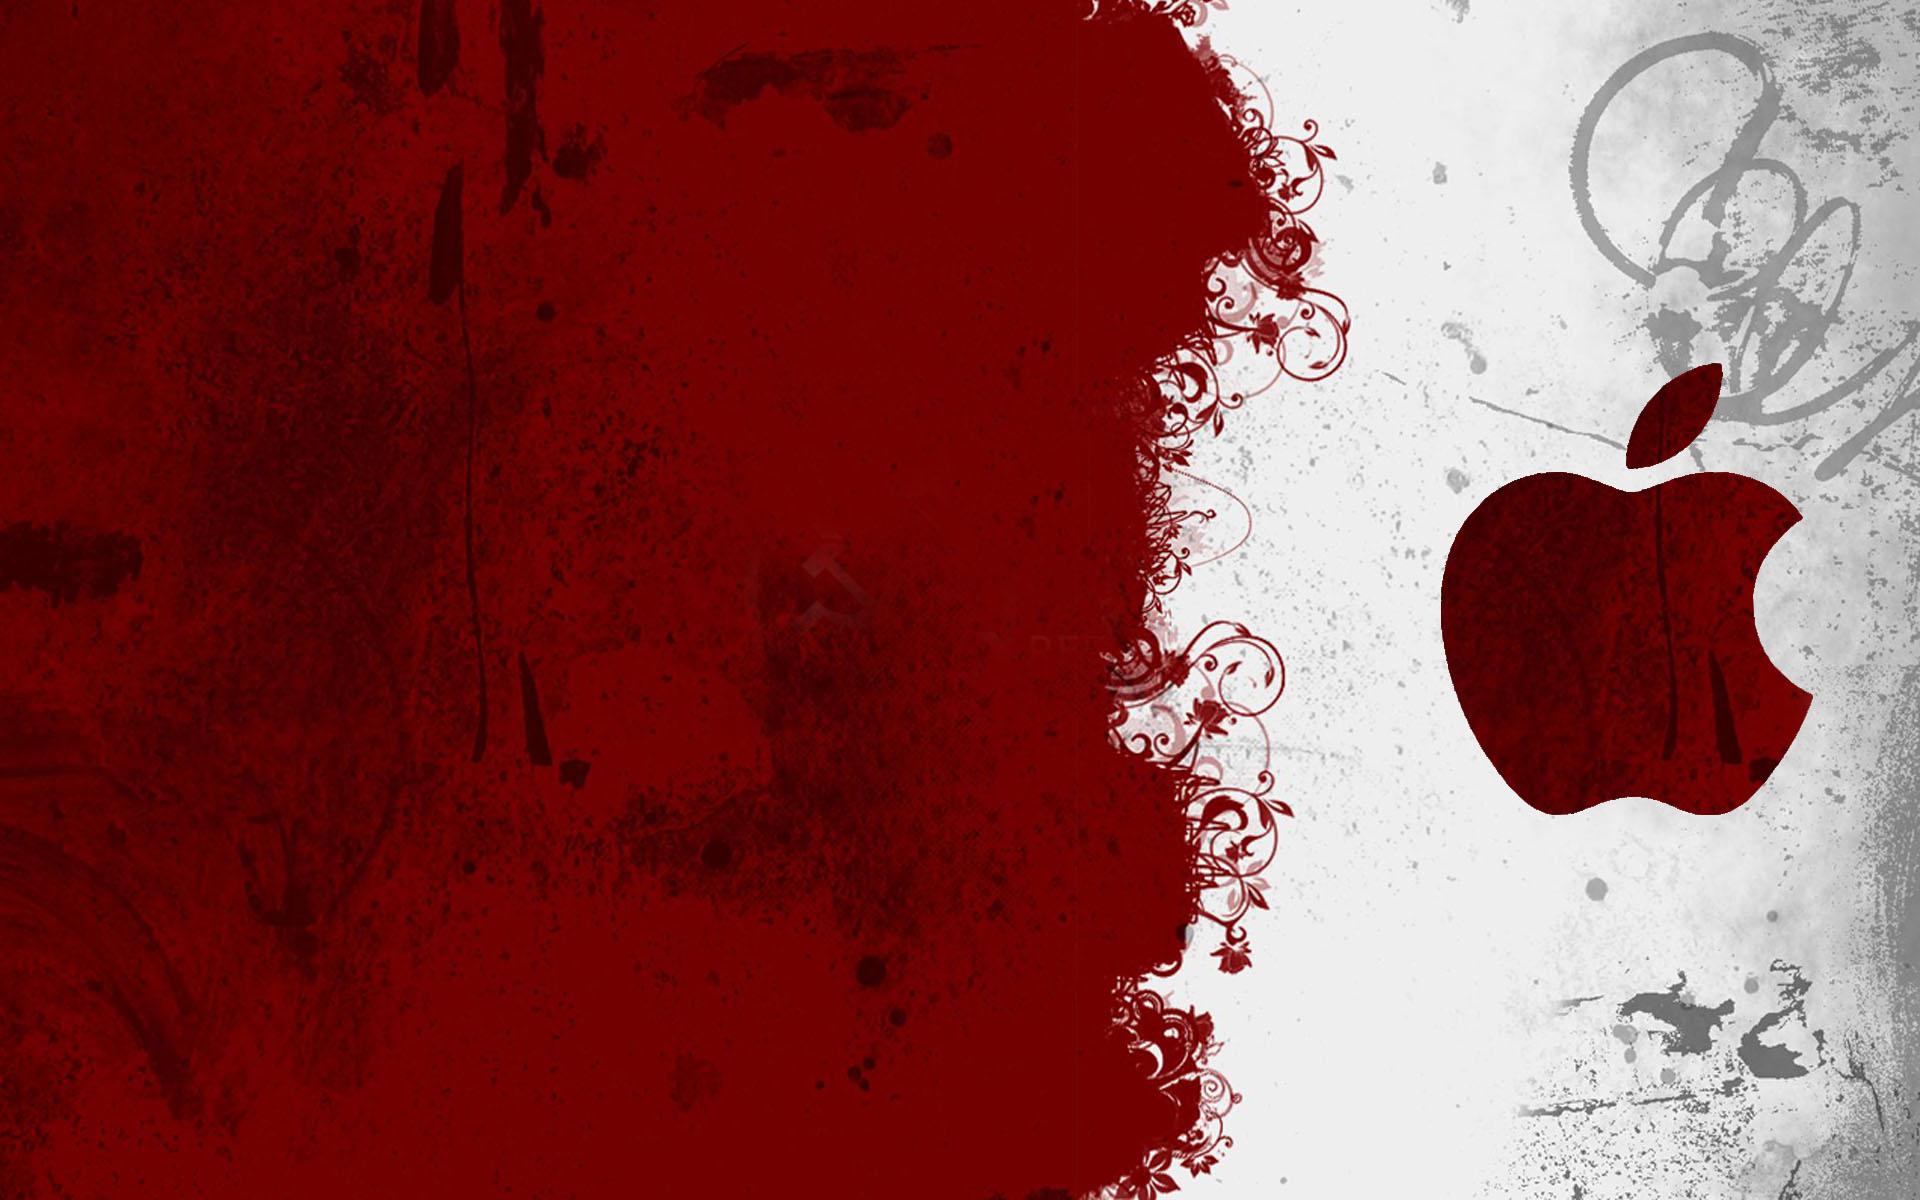 wallpapers mac desktop cool wallpaper revolution red abstract 1920x1200